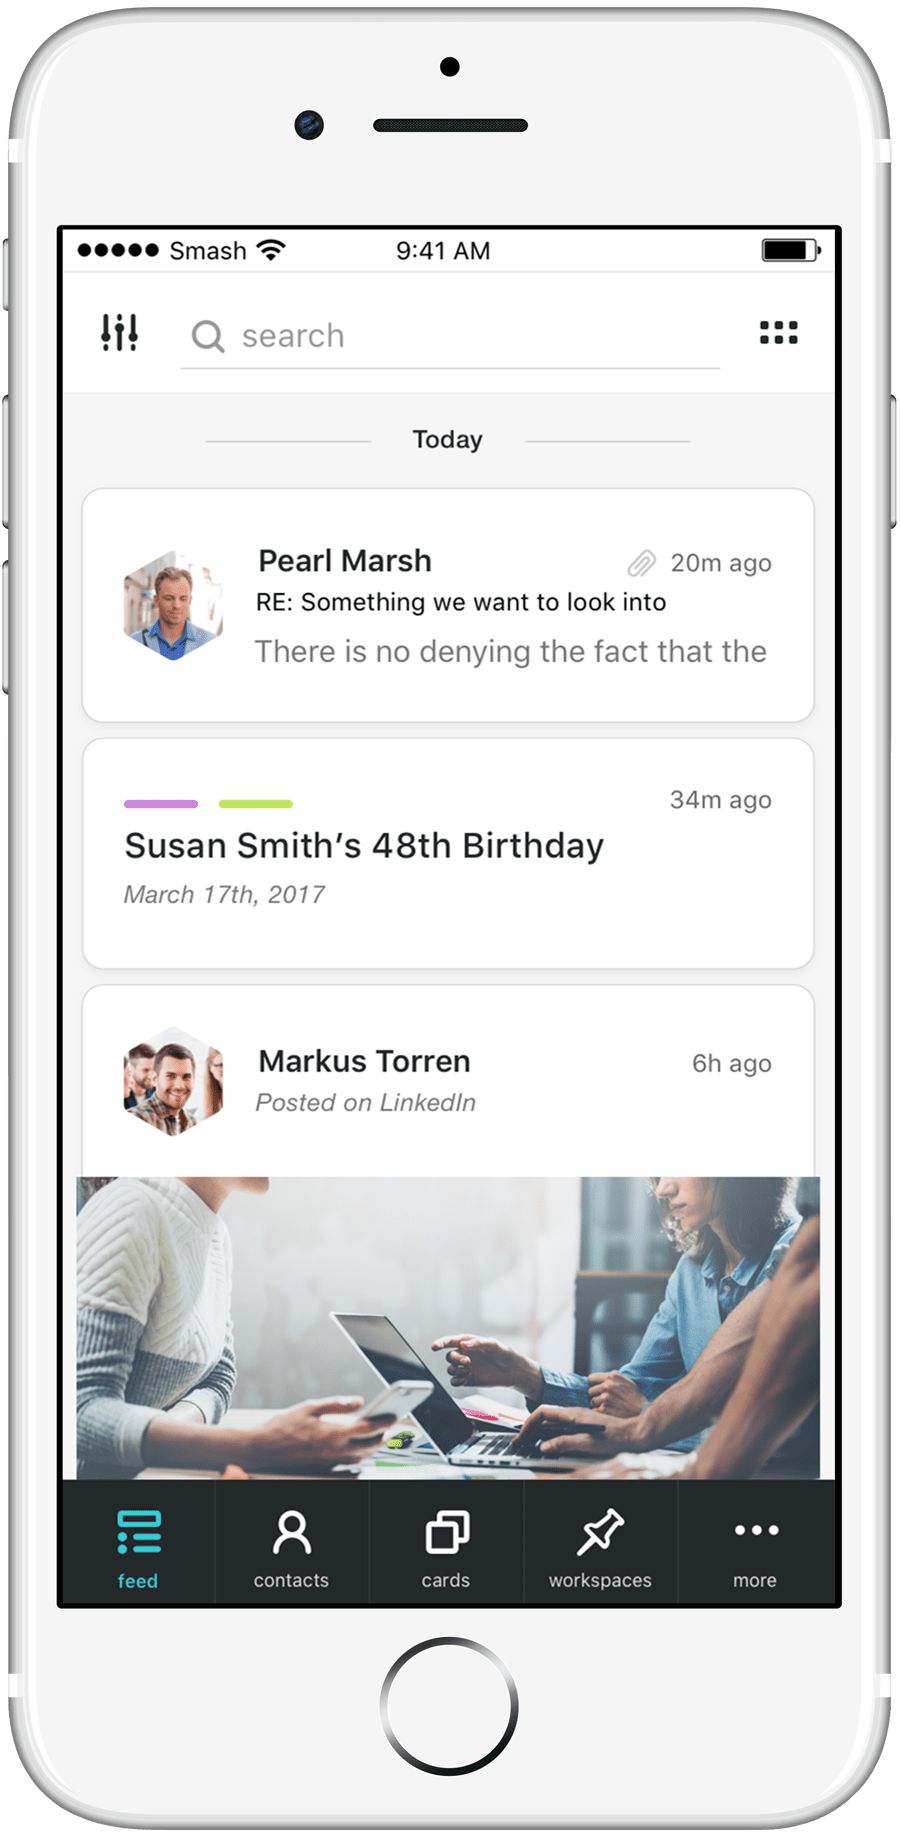 Smash feed 2.0 in iPhone mockup